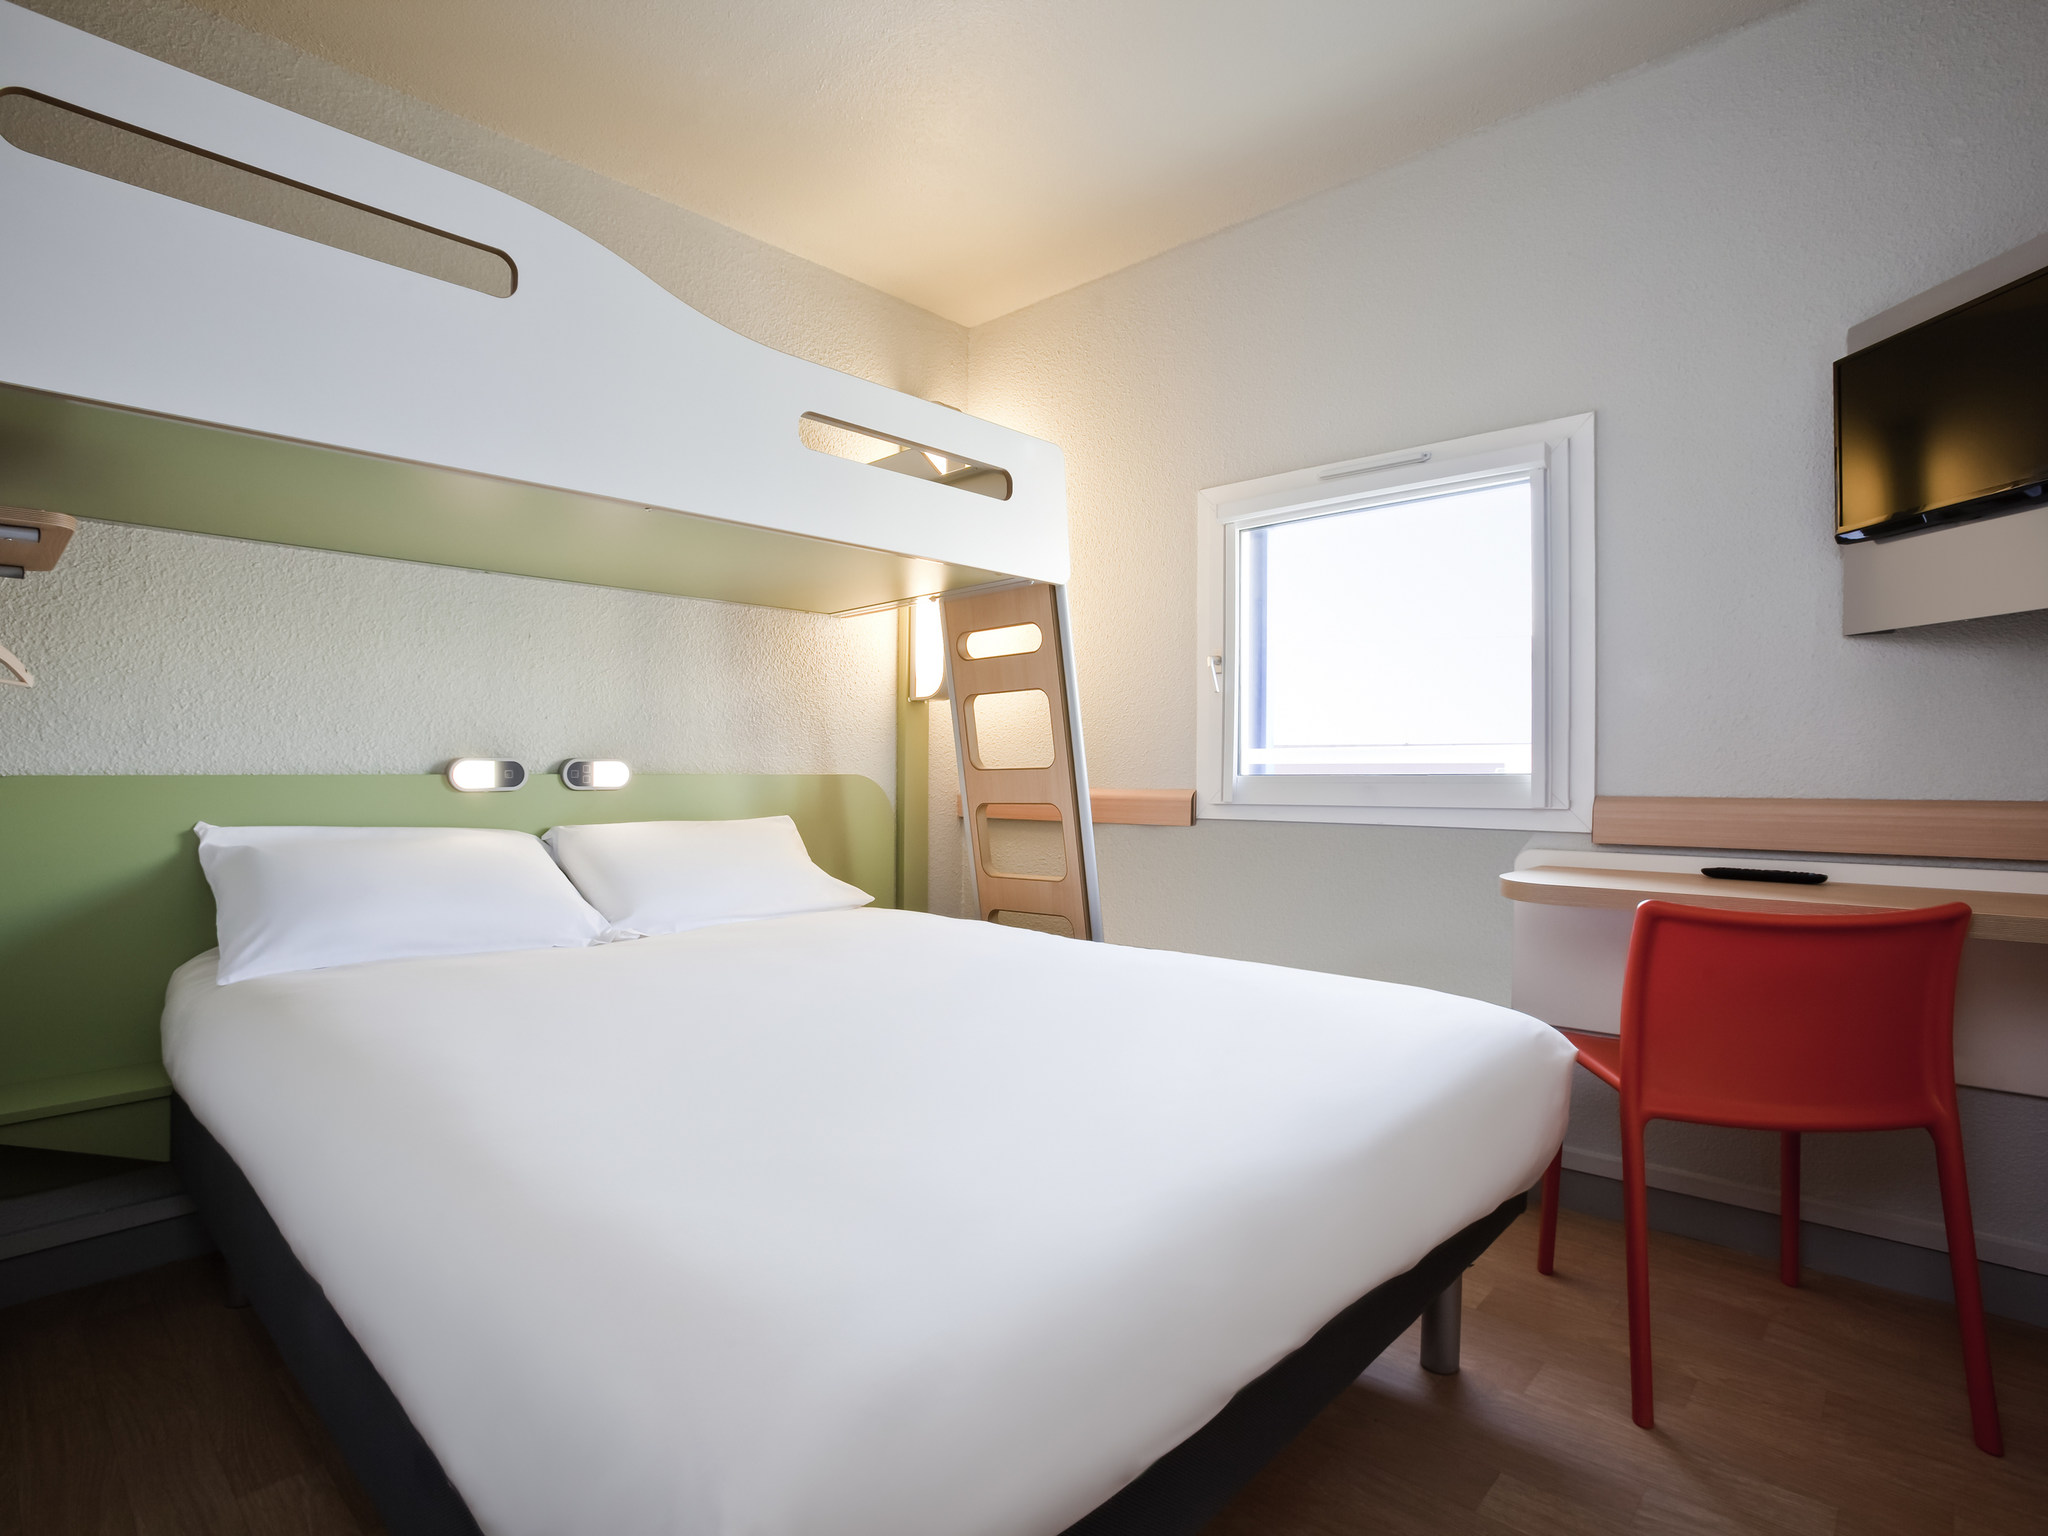 Hotel - ibis budget Pontault Combault RN4 Marne la Vallée